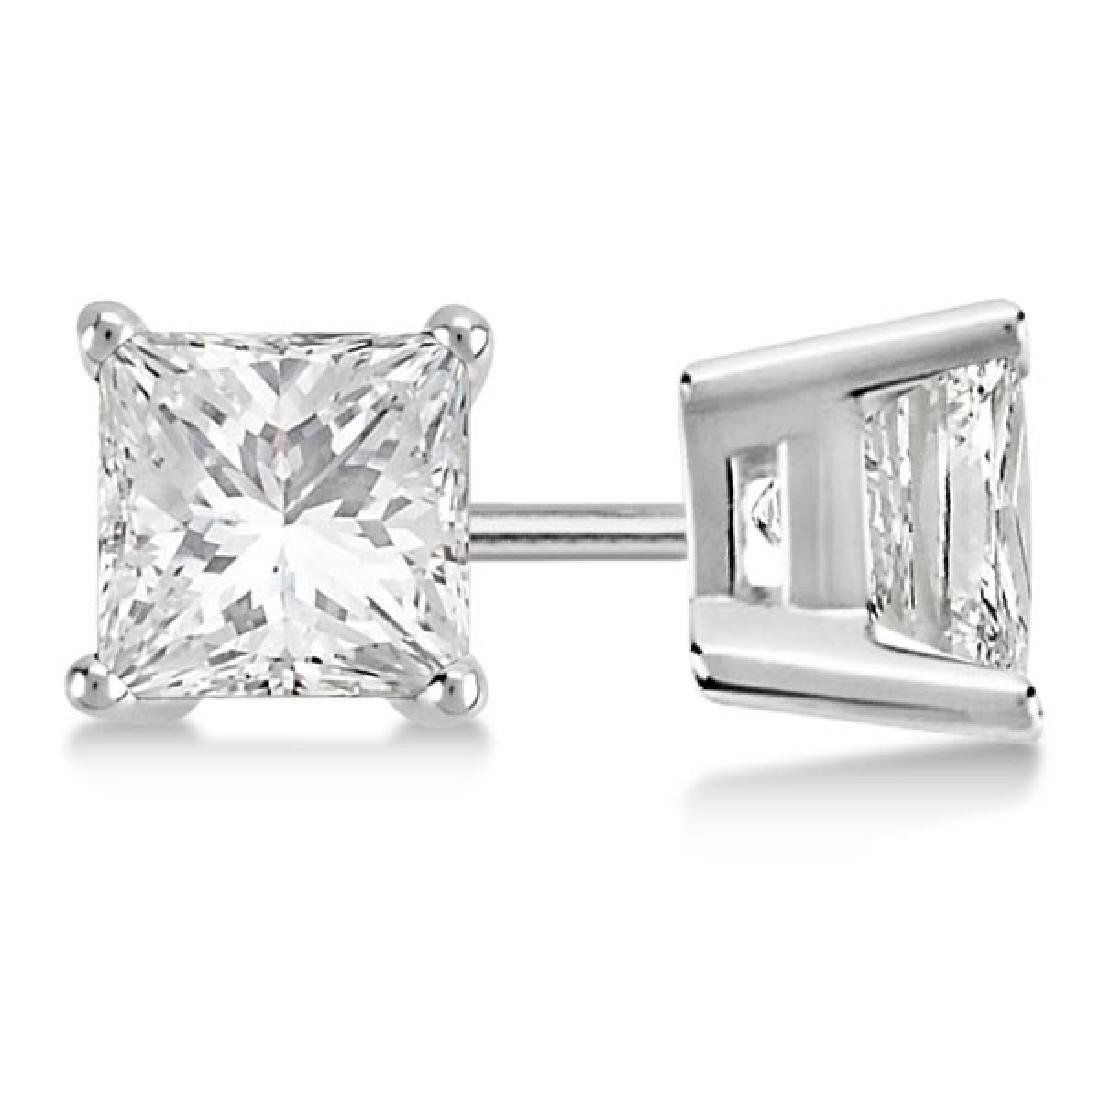 Certified 1 CTW Princess Diamond Stud Earrings D/SI3